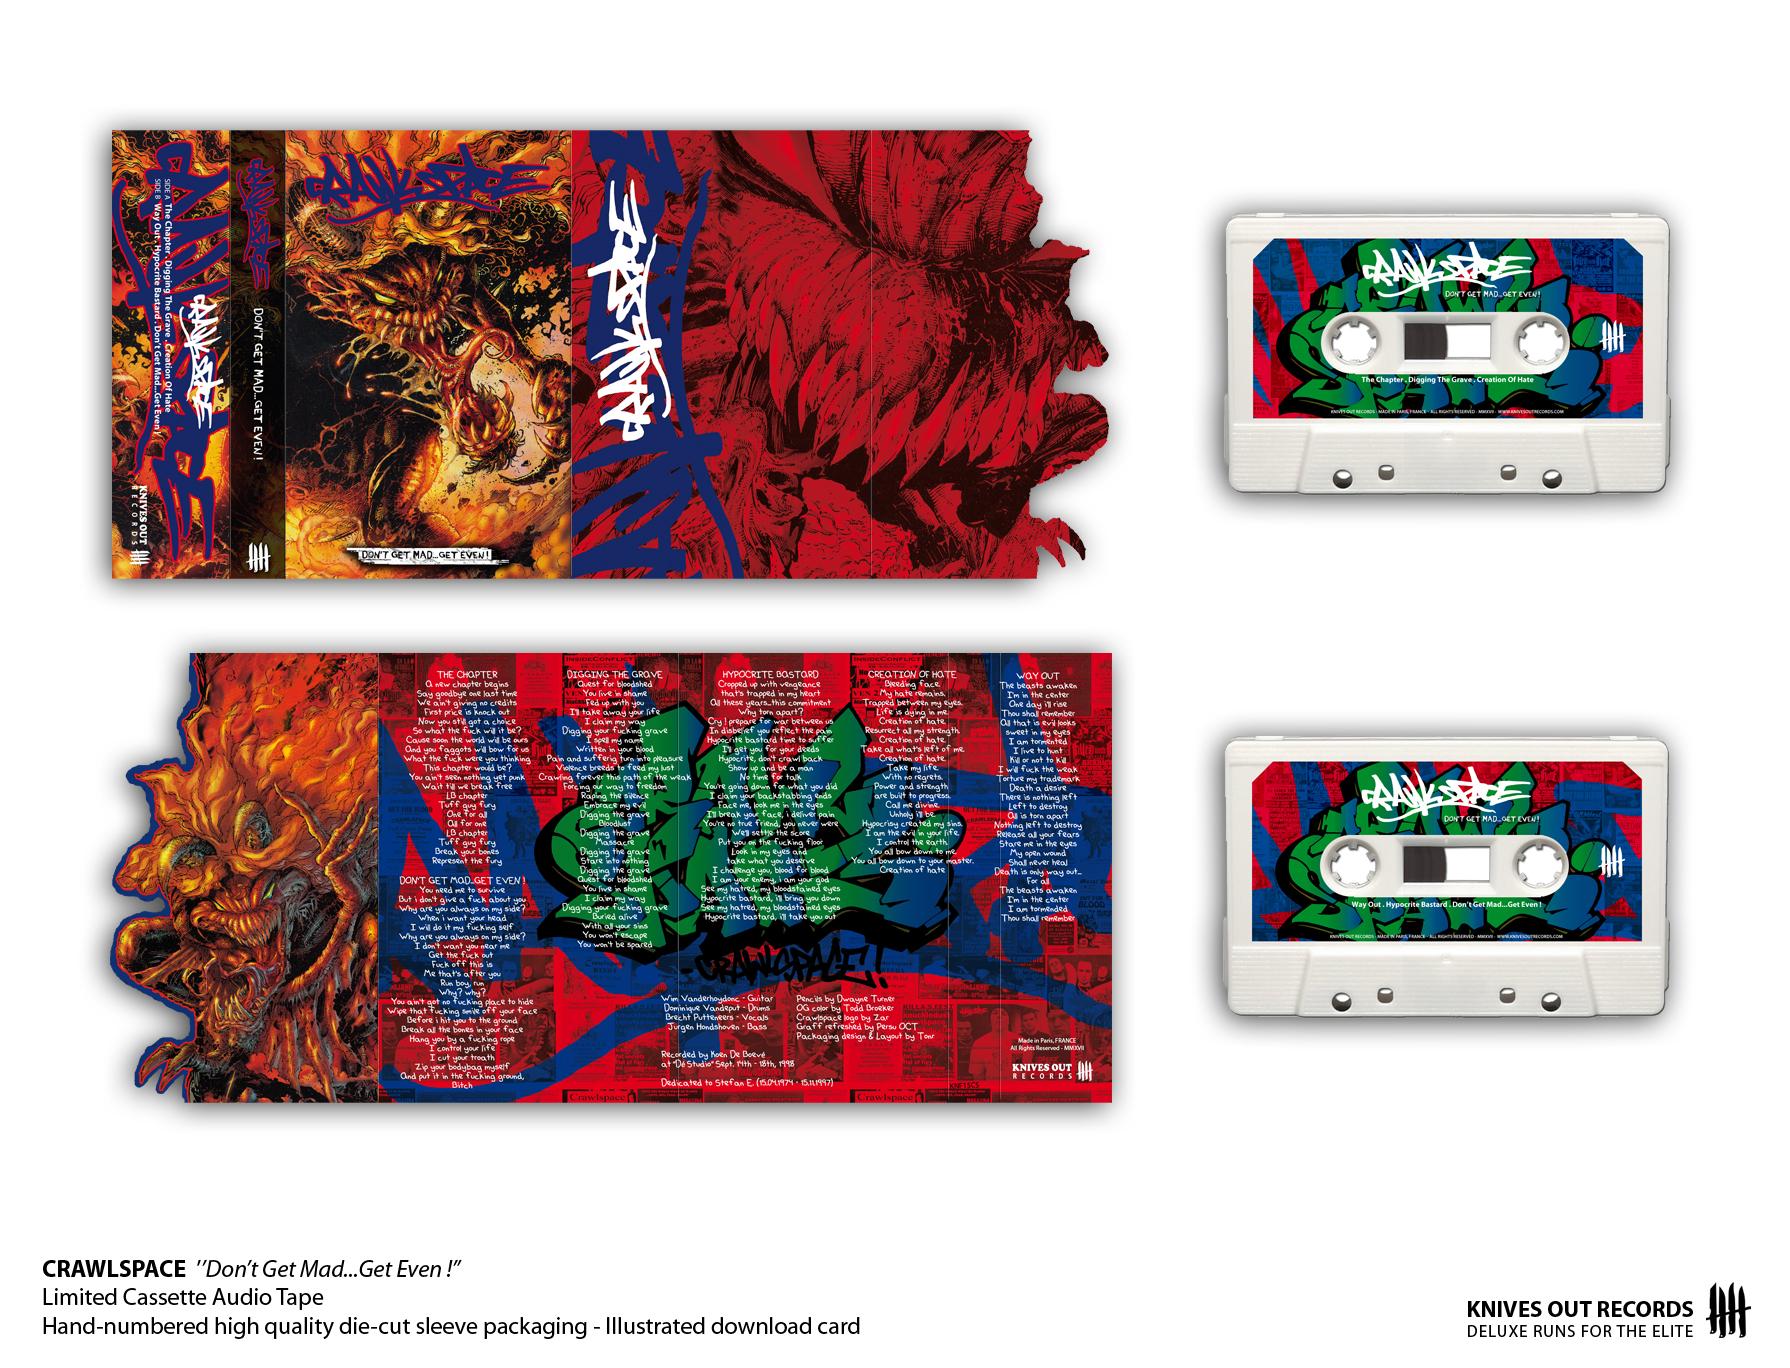 CRAWLSPACE 'Dont Get Mad...Get Even !' Cassette Audio Tape